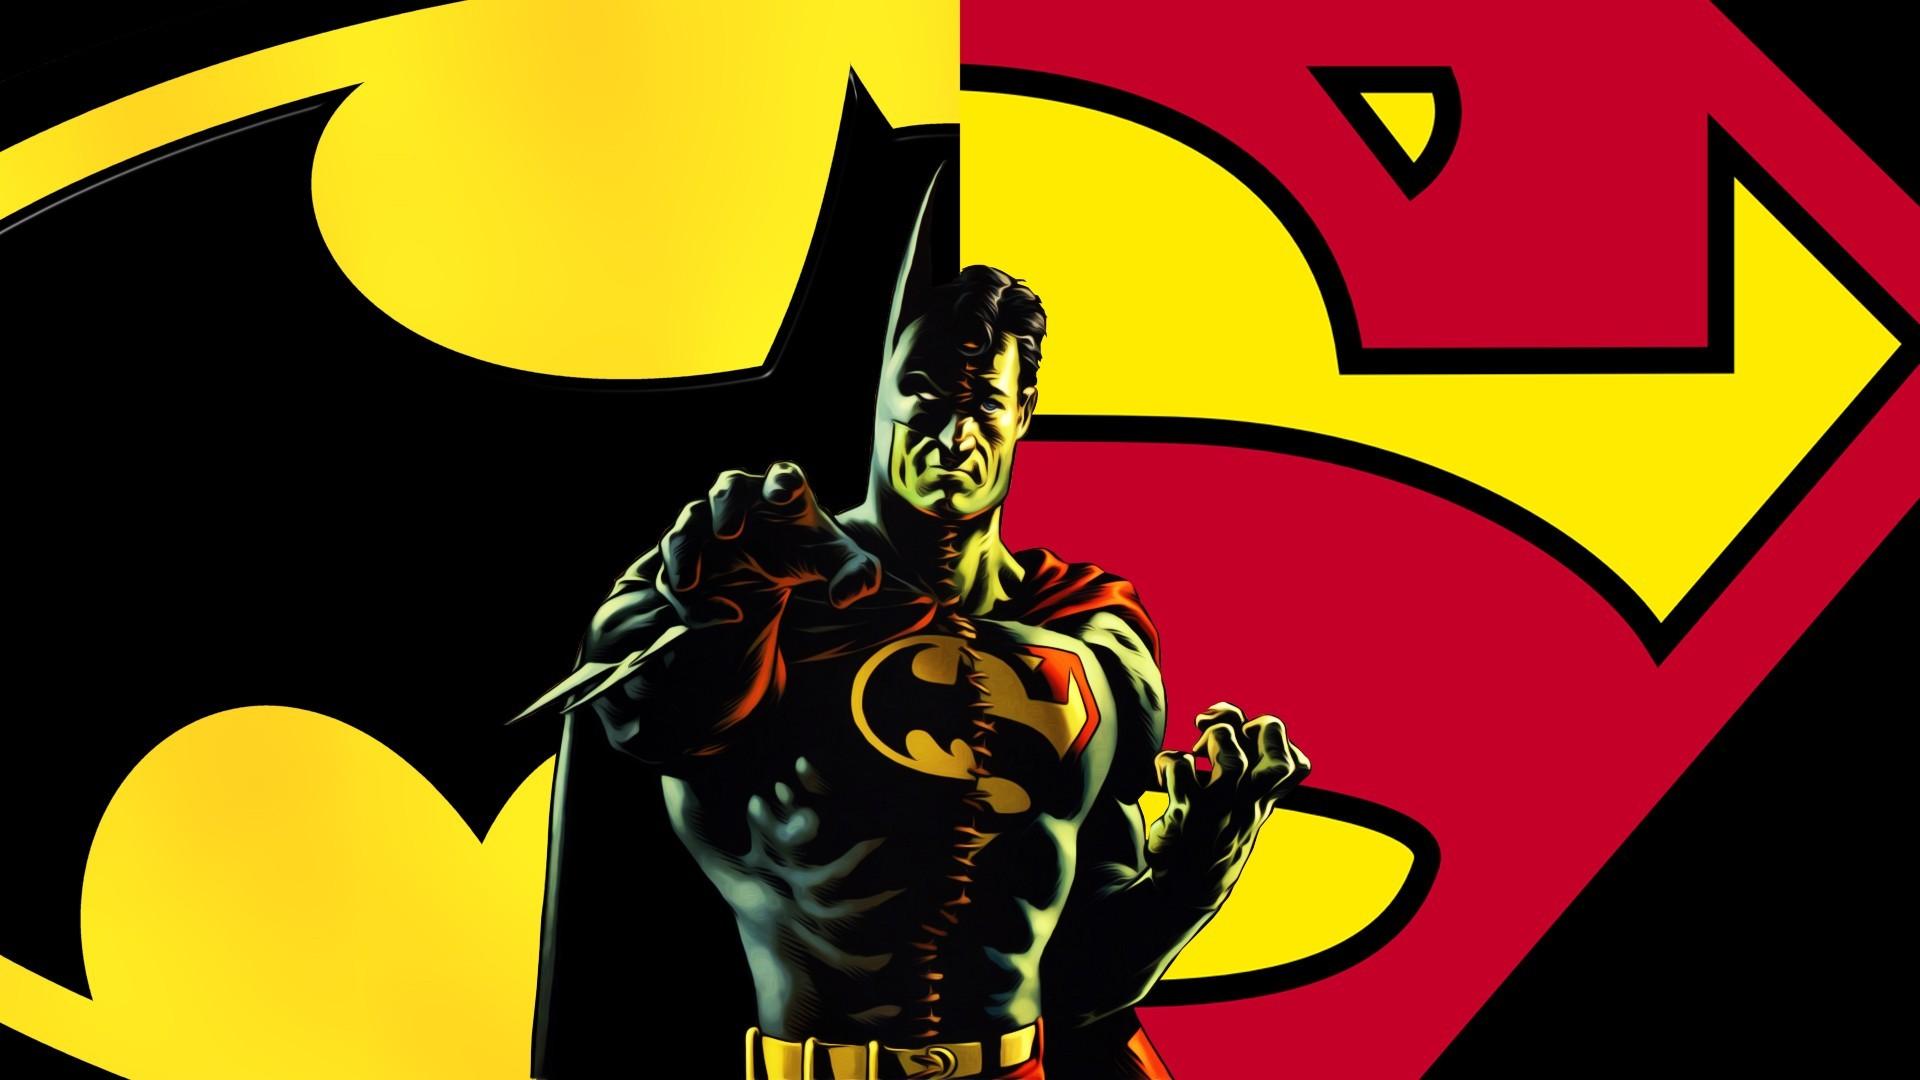 Бен Аффлек решил уйти из «Бэтмена против Супермена»  - Изображение 1